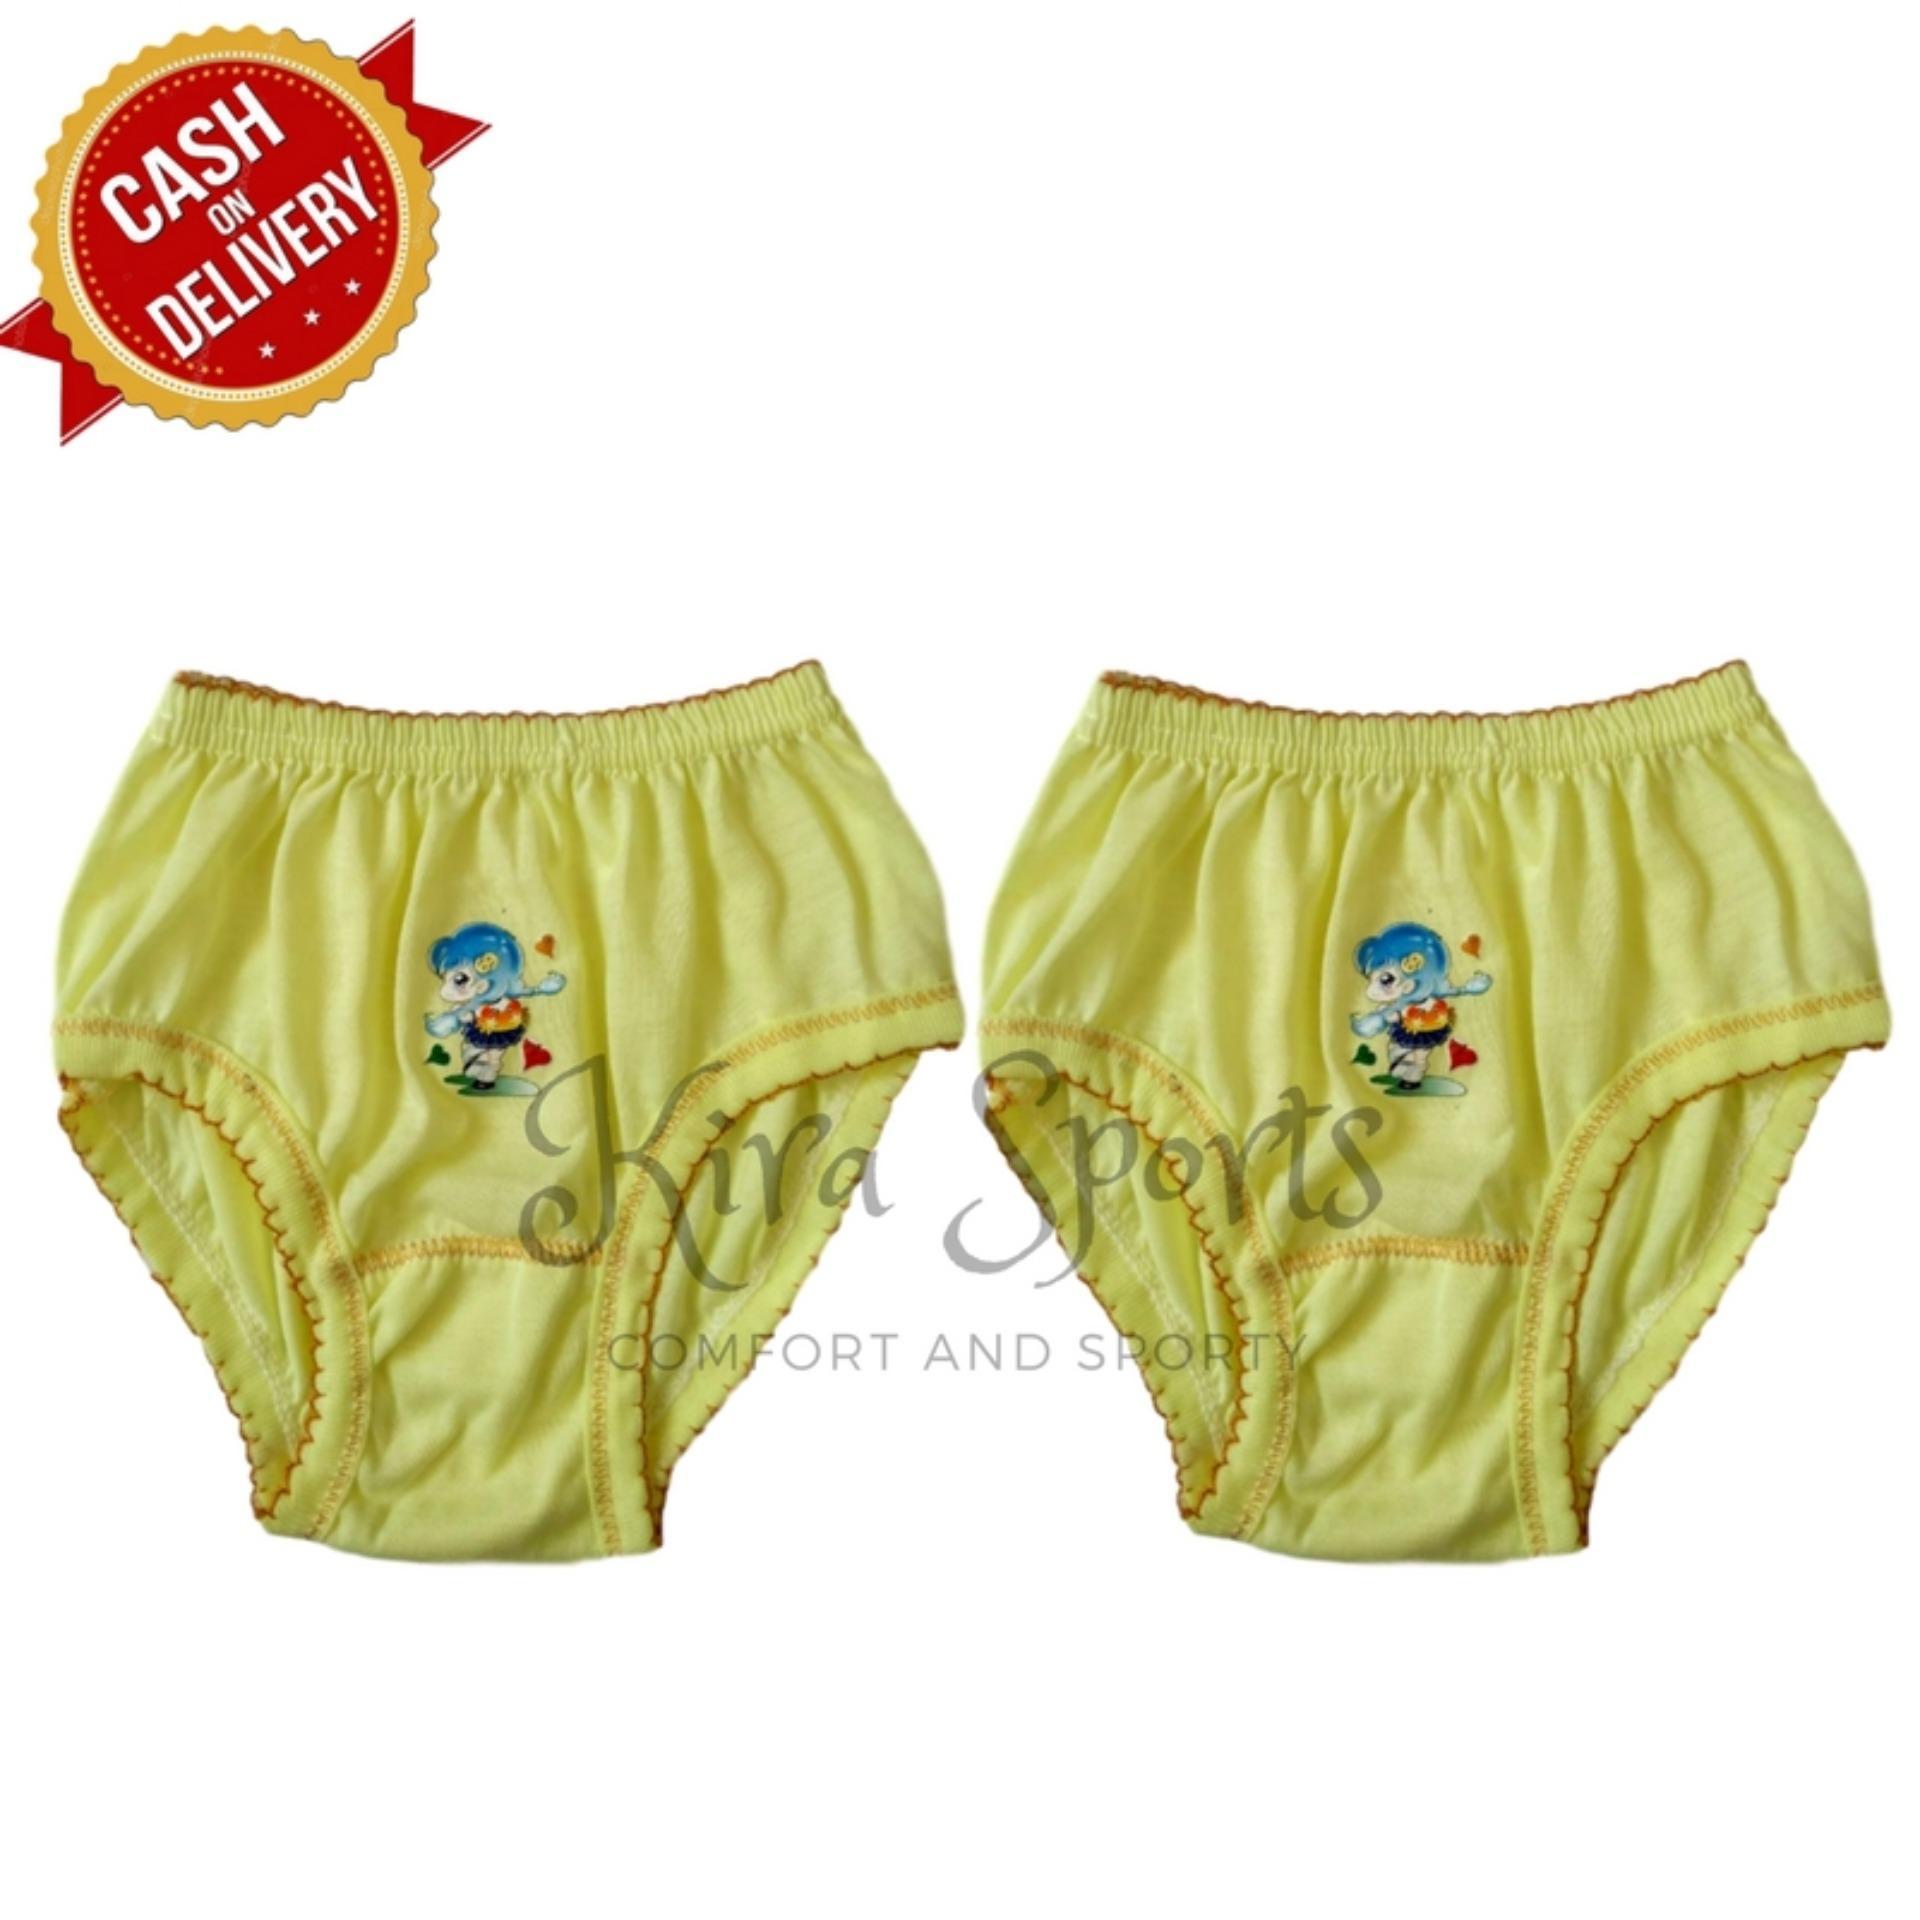 Daftar Harga Celana Dalam Transparan Untuk Wanita Termurah 2019 aa28c0fb90